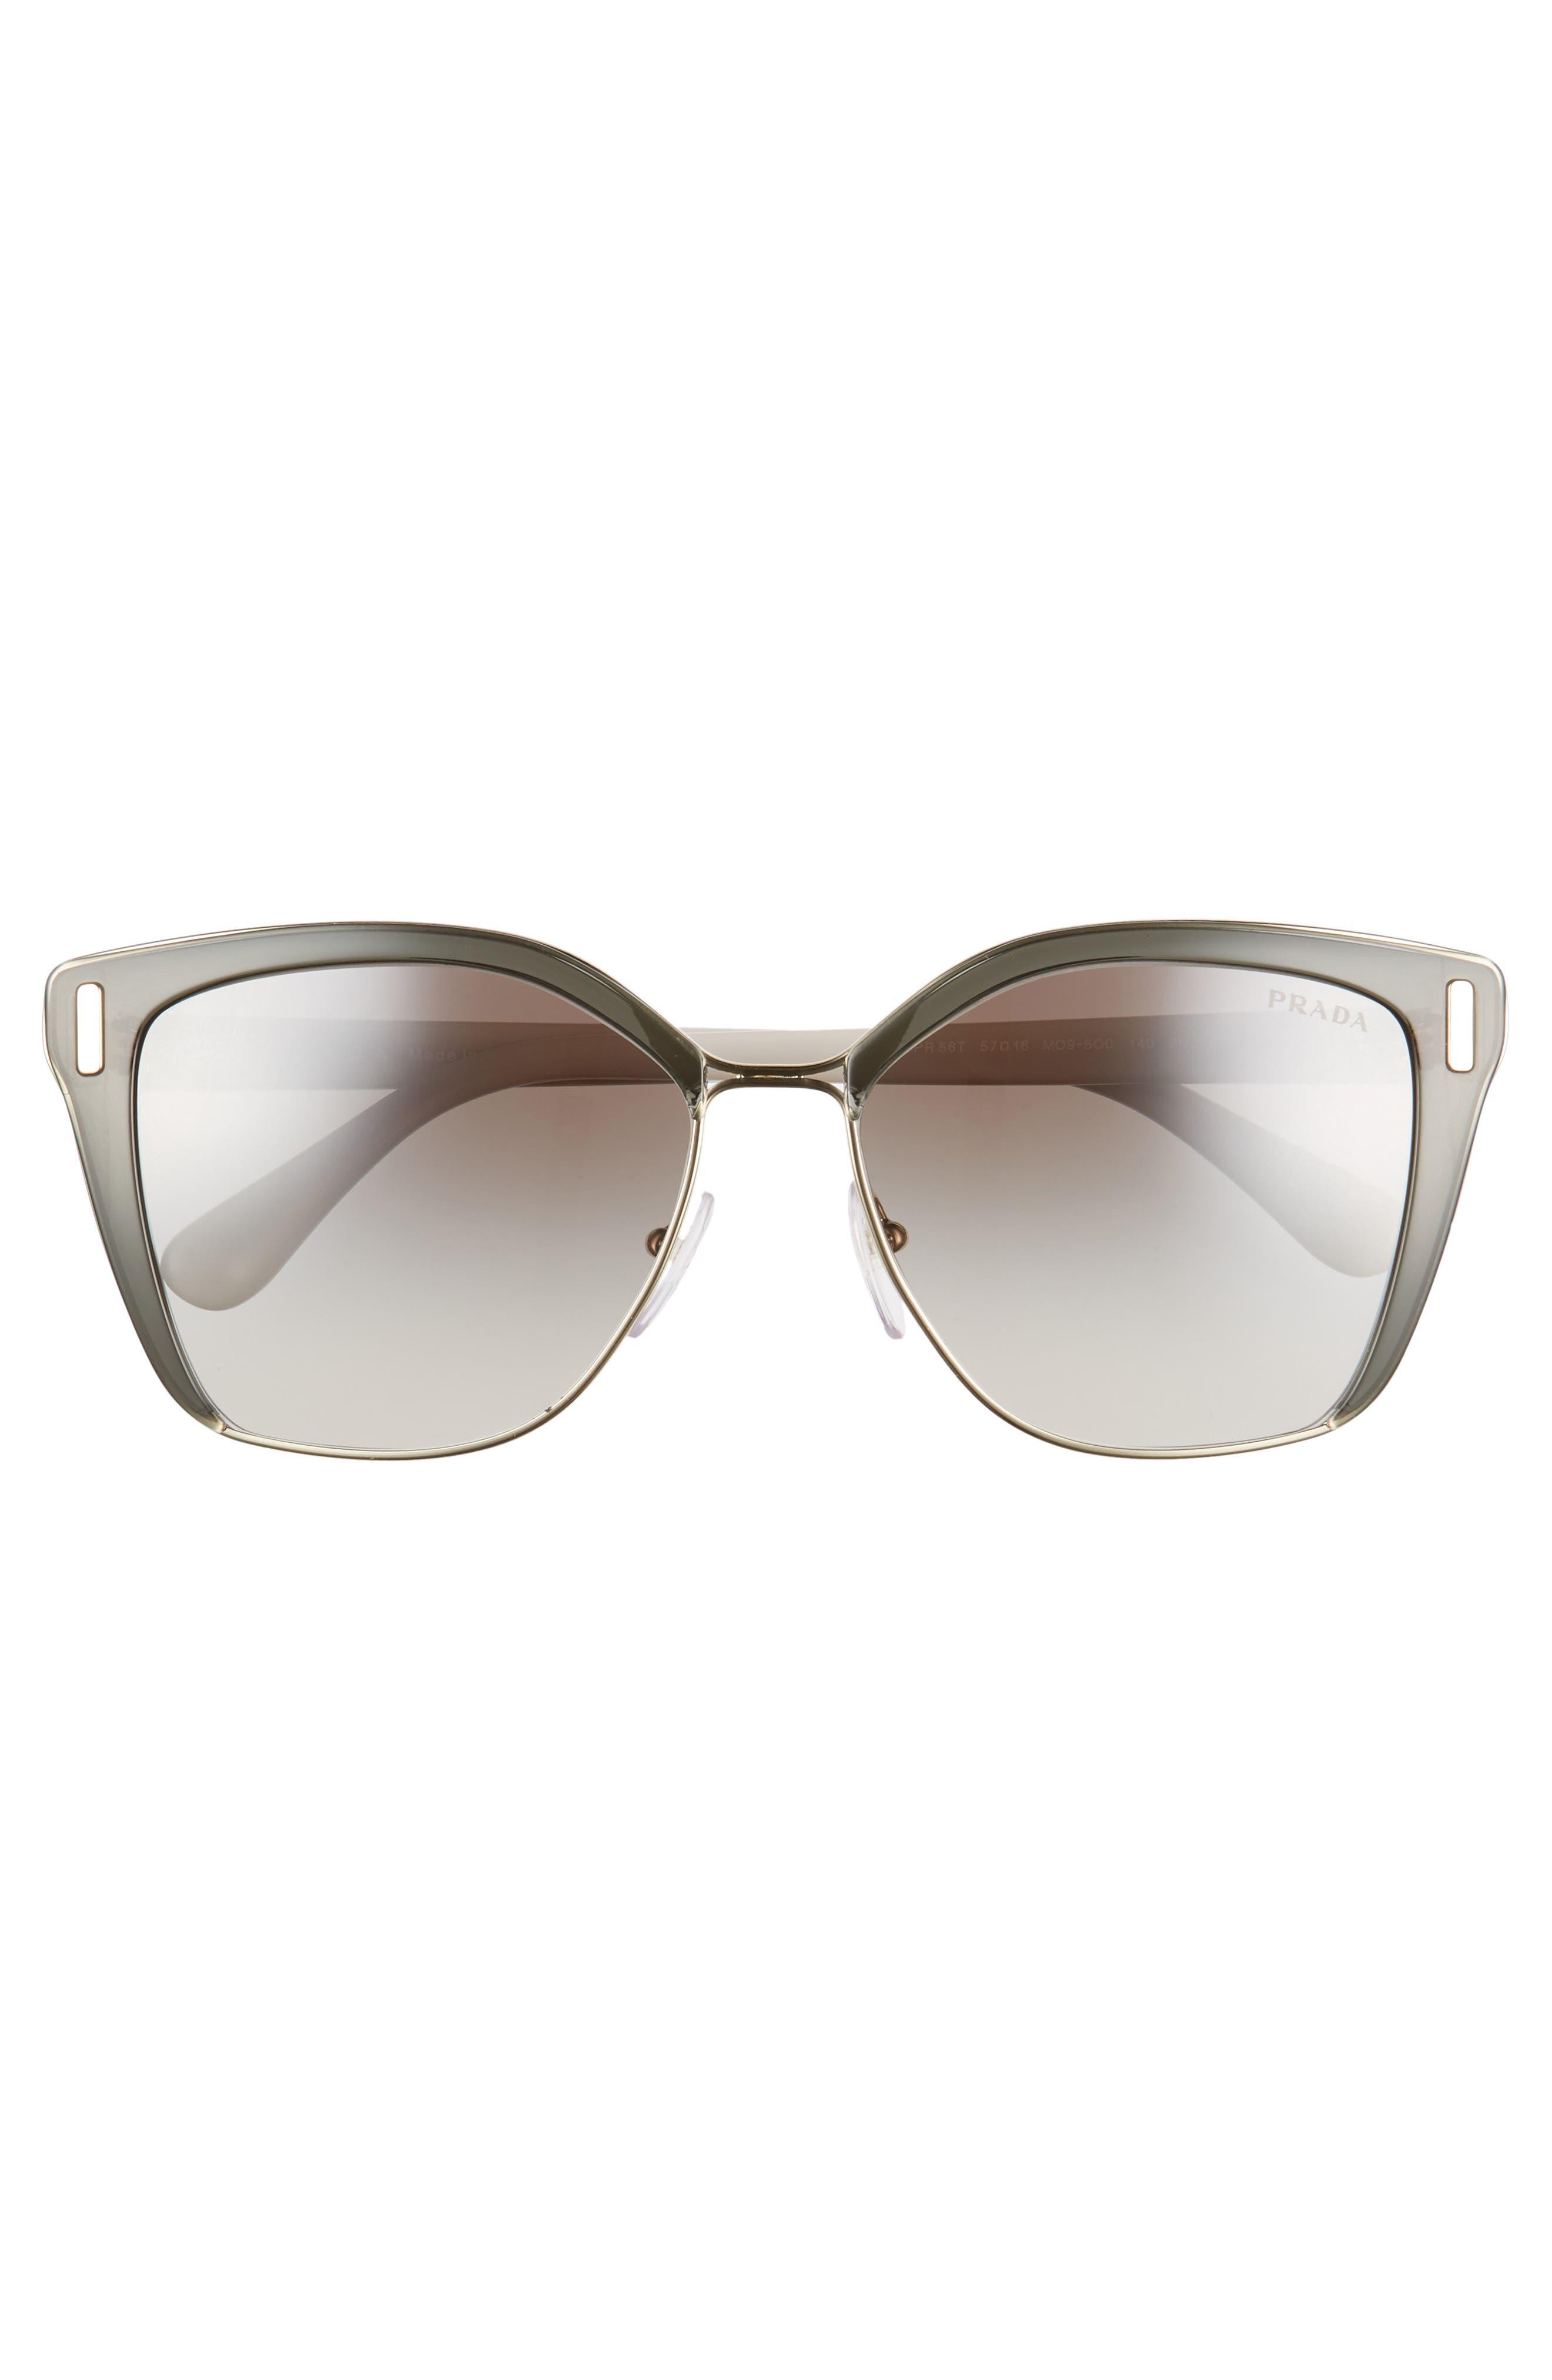 54mm Gradient Geometric Sunglasses,                             Alternate thumbnail 3, color,                             GREY/ GOLD GRADIENT MIRROR